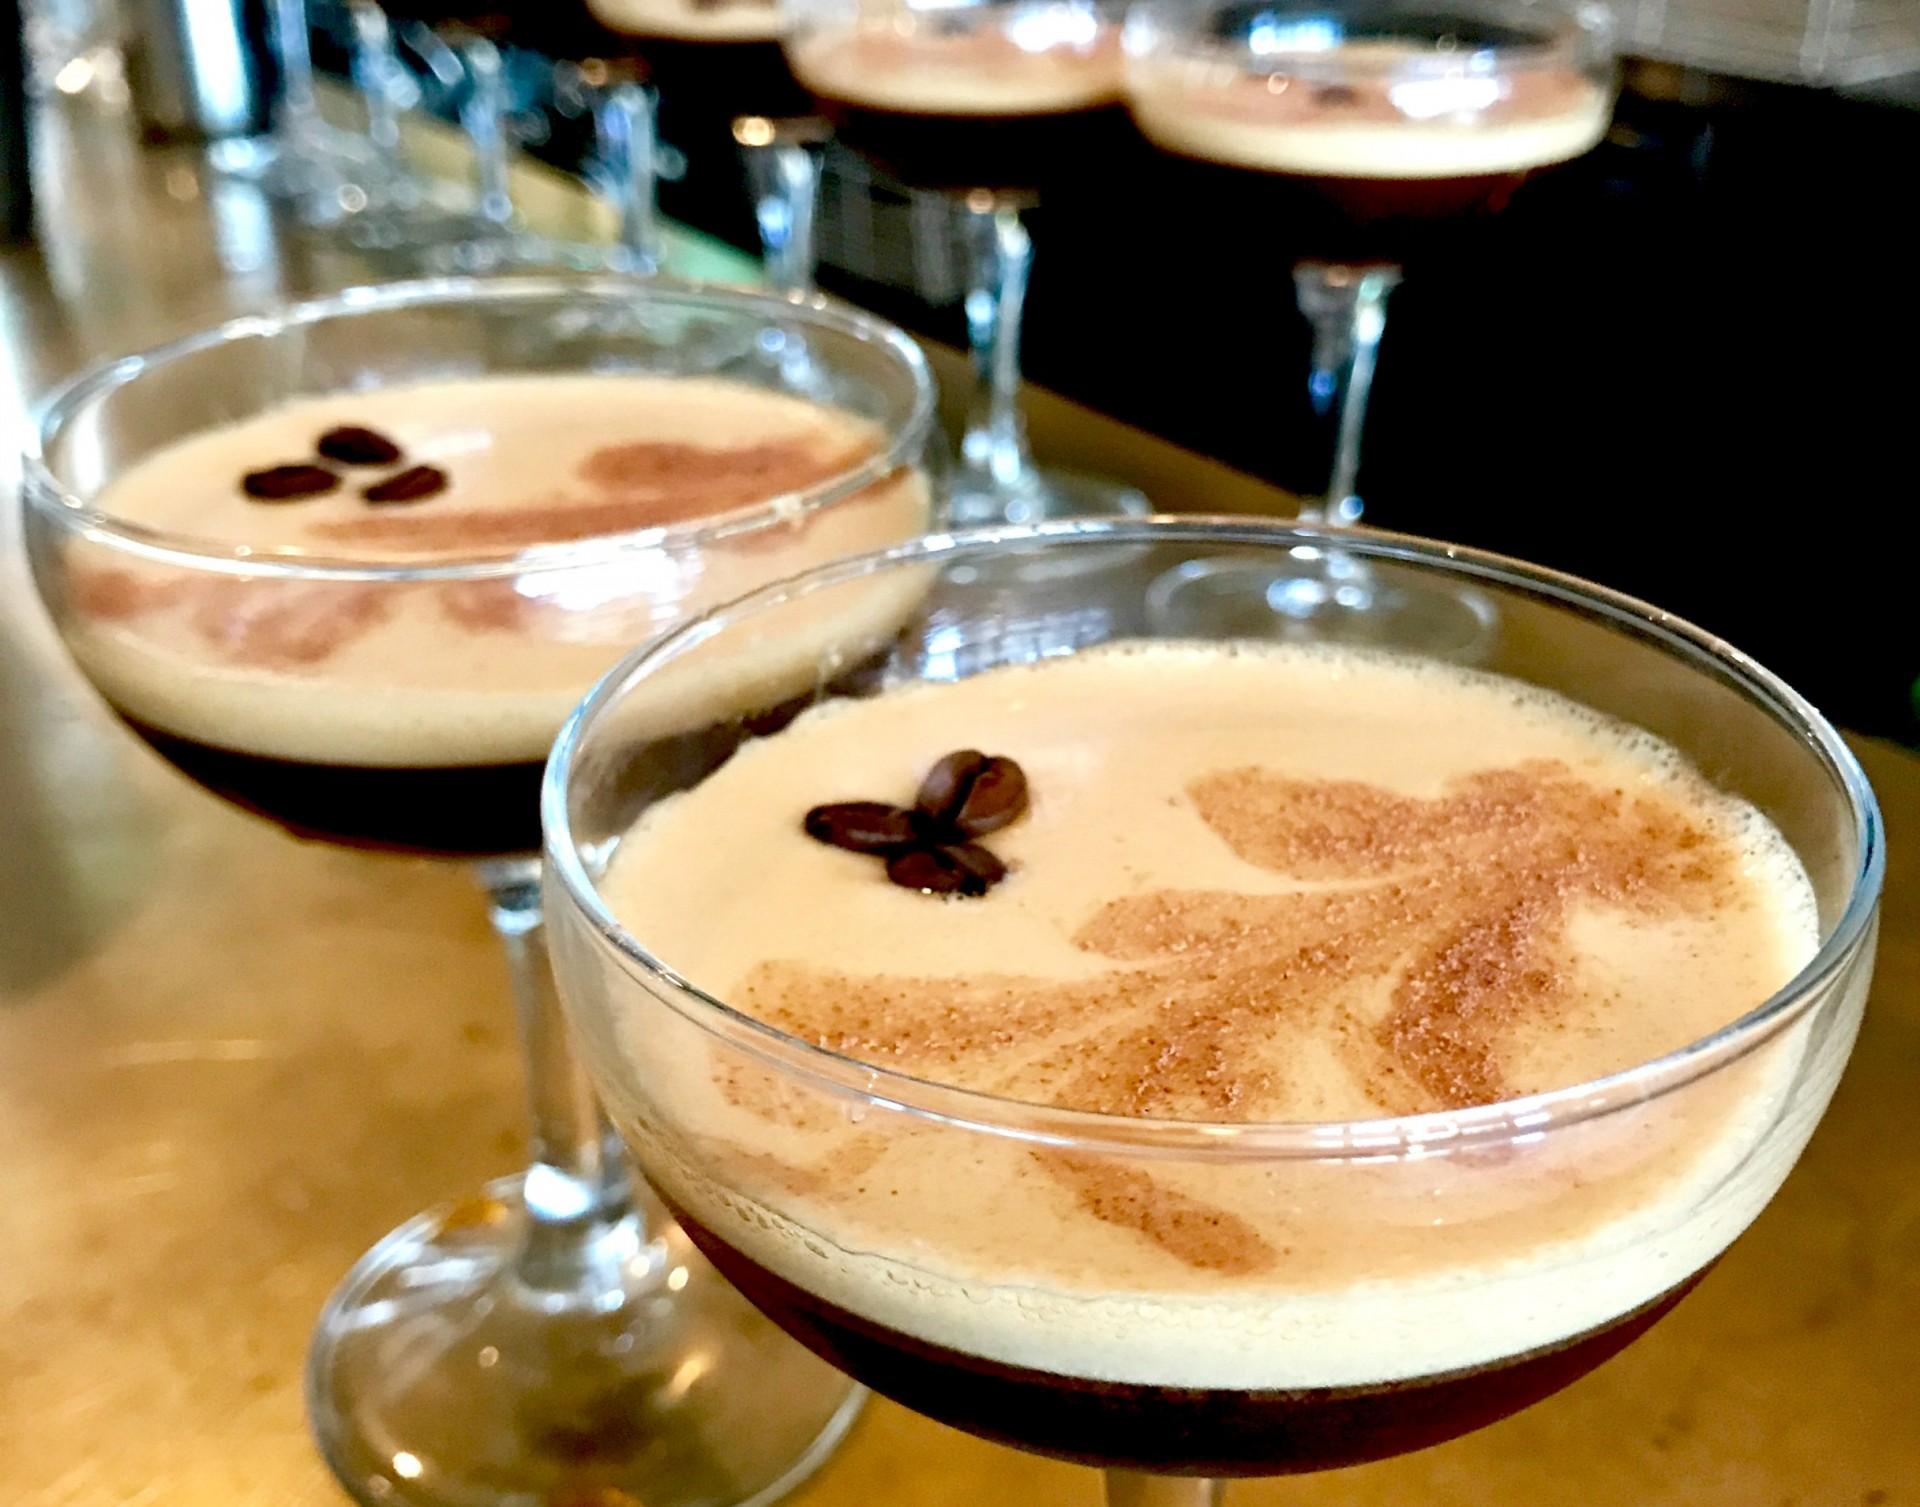 cambridge food tour martini